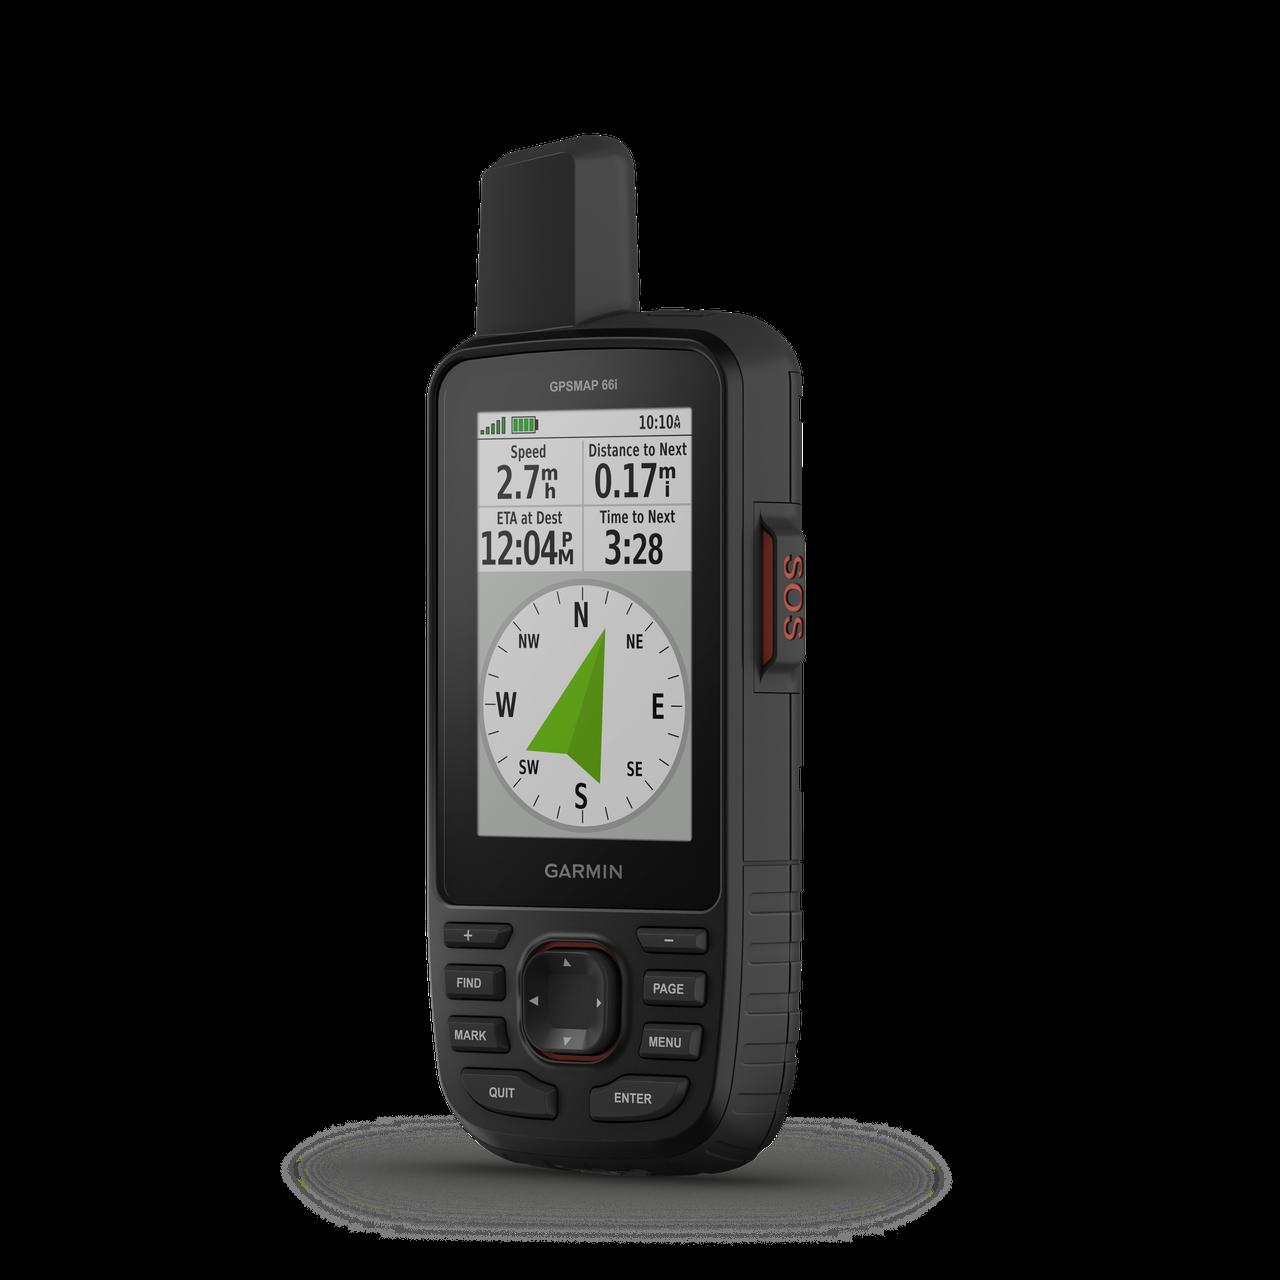 Навигатор Garmin GPSMAP 66i